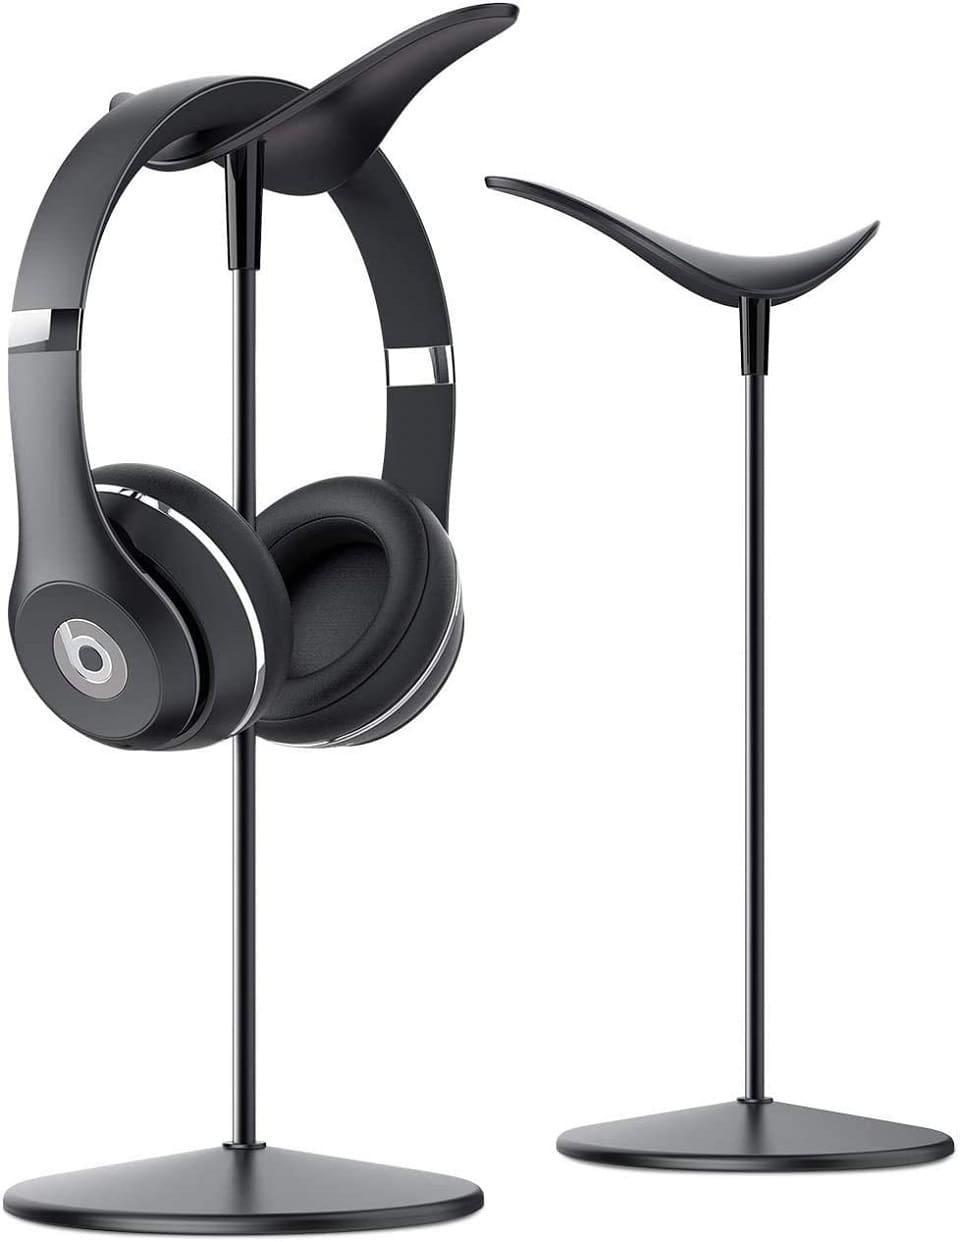 Lamicall Studio Headphones Stand